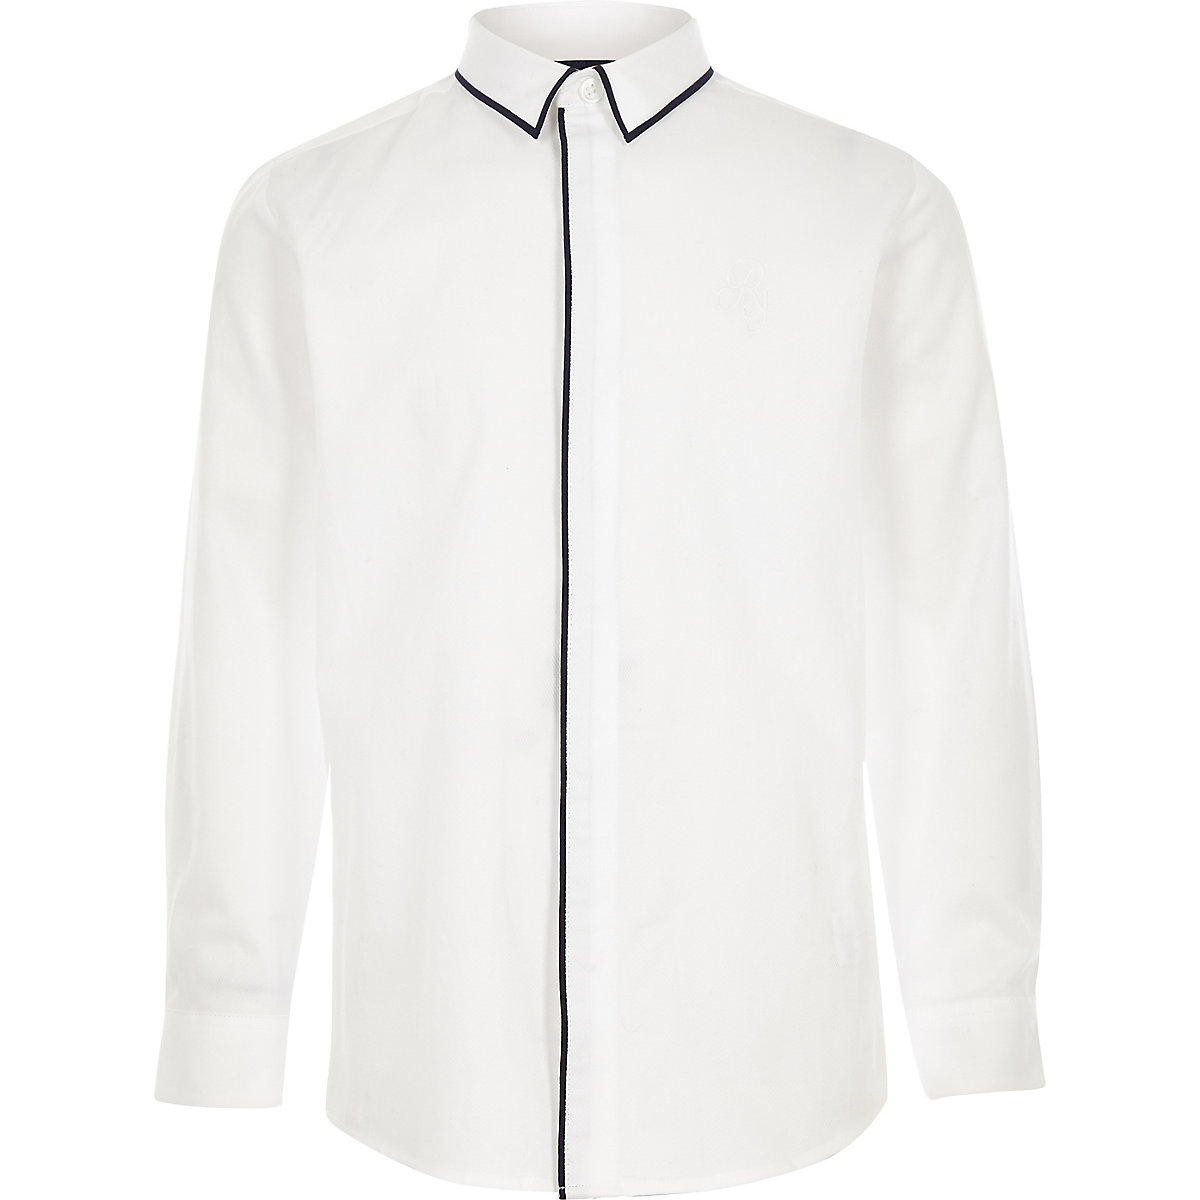 Boys white RI piped long sleeve shirt